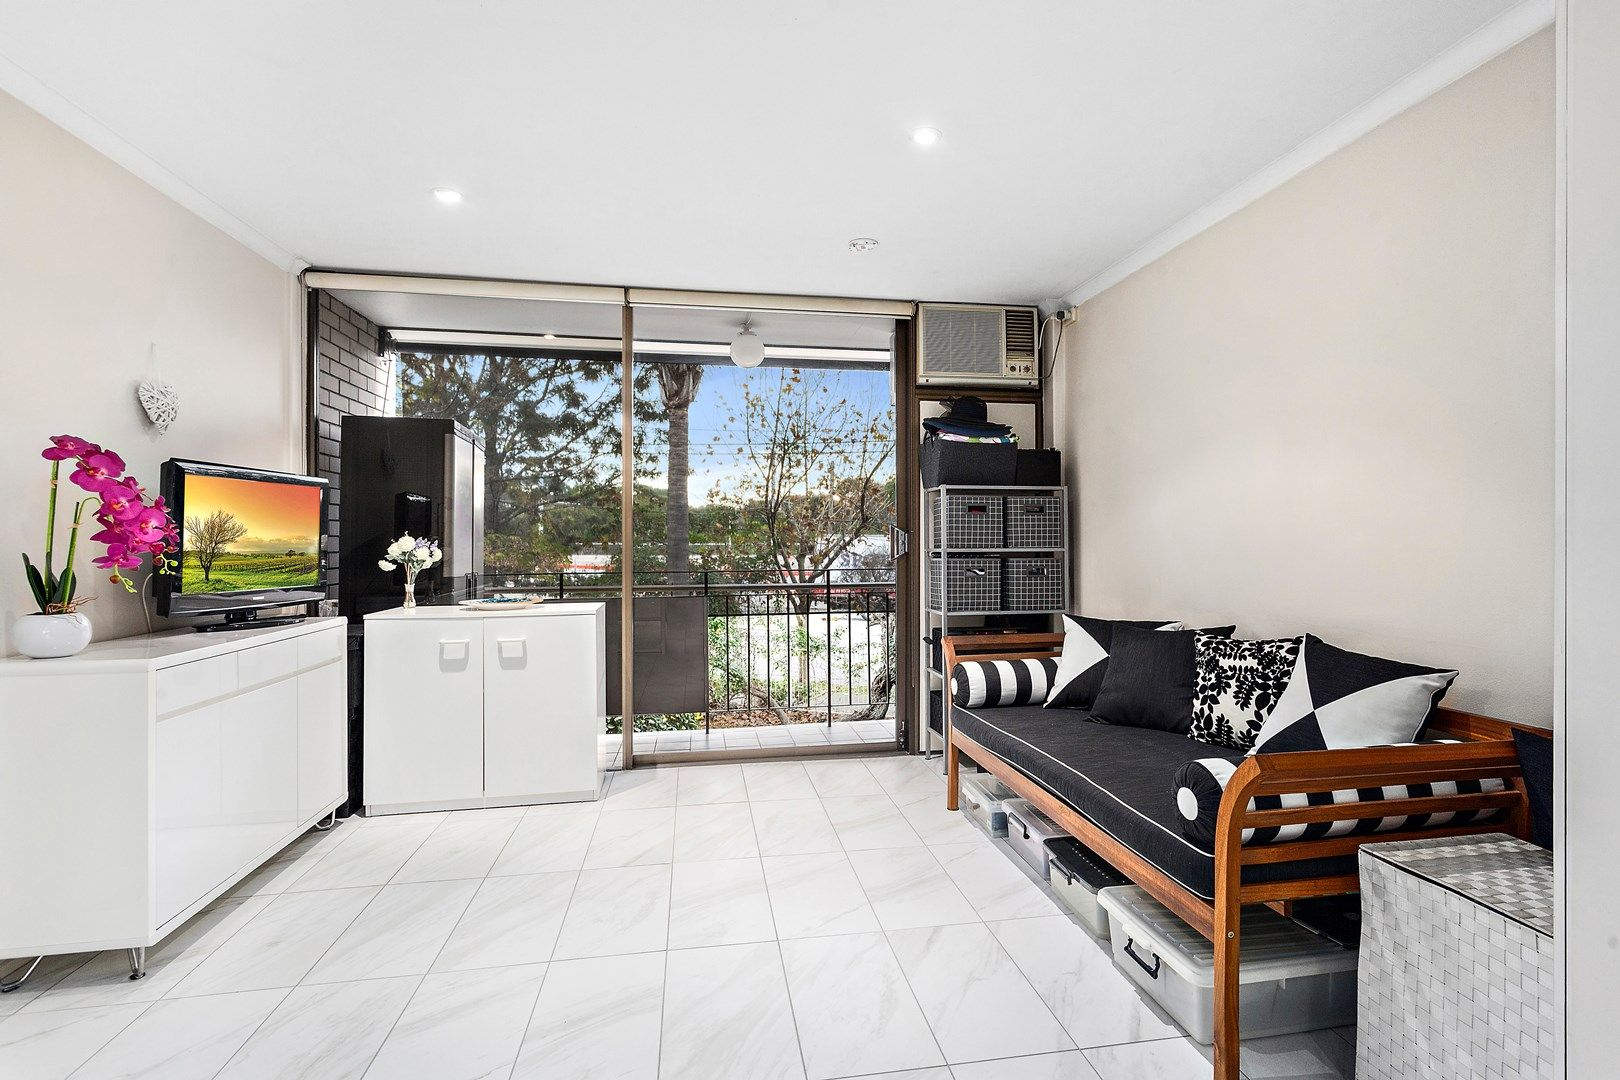 15/35 Alison Road, Kensington NSW 2033, Image 0